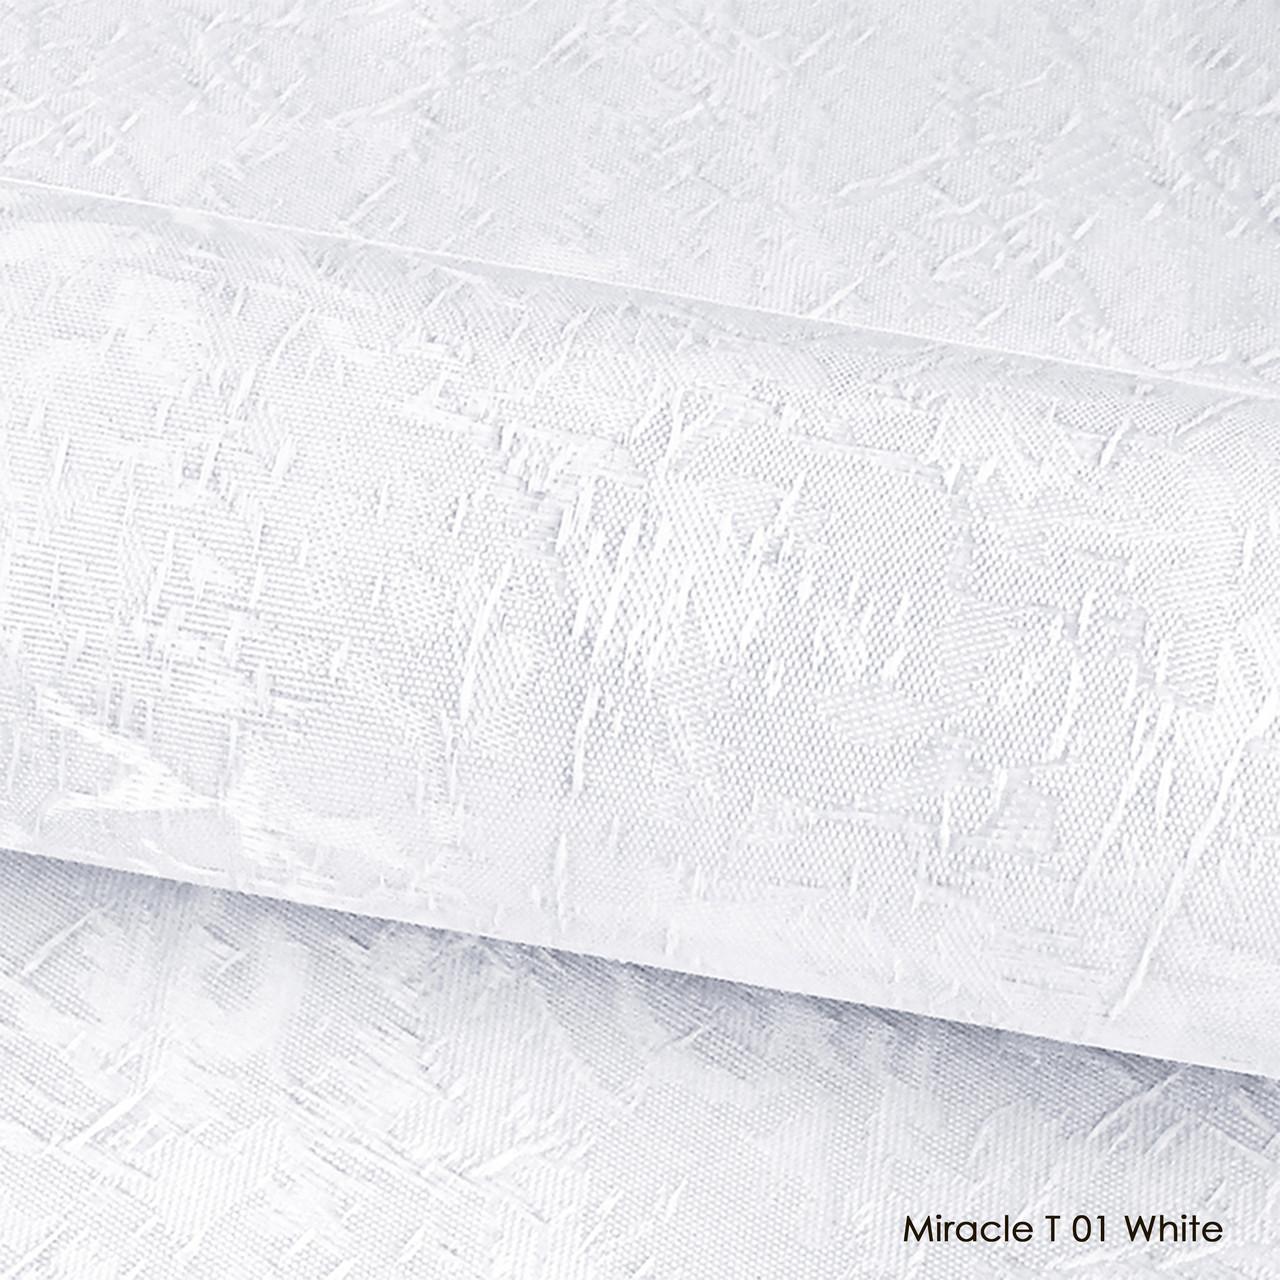 Ролети тканинні Miracle T 01 White